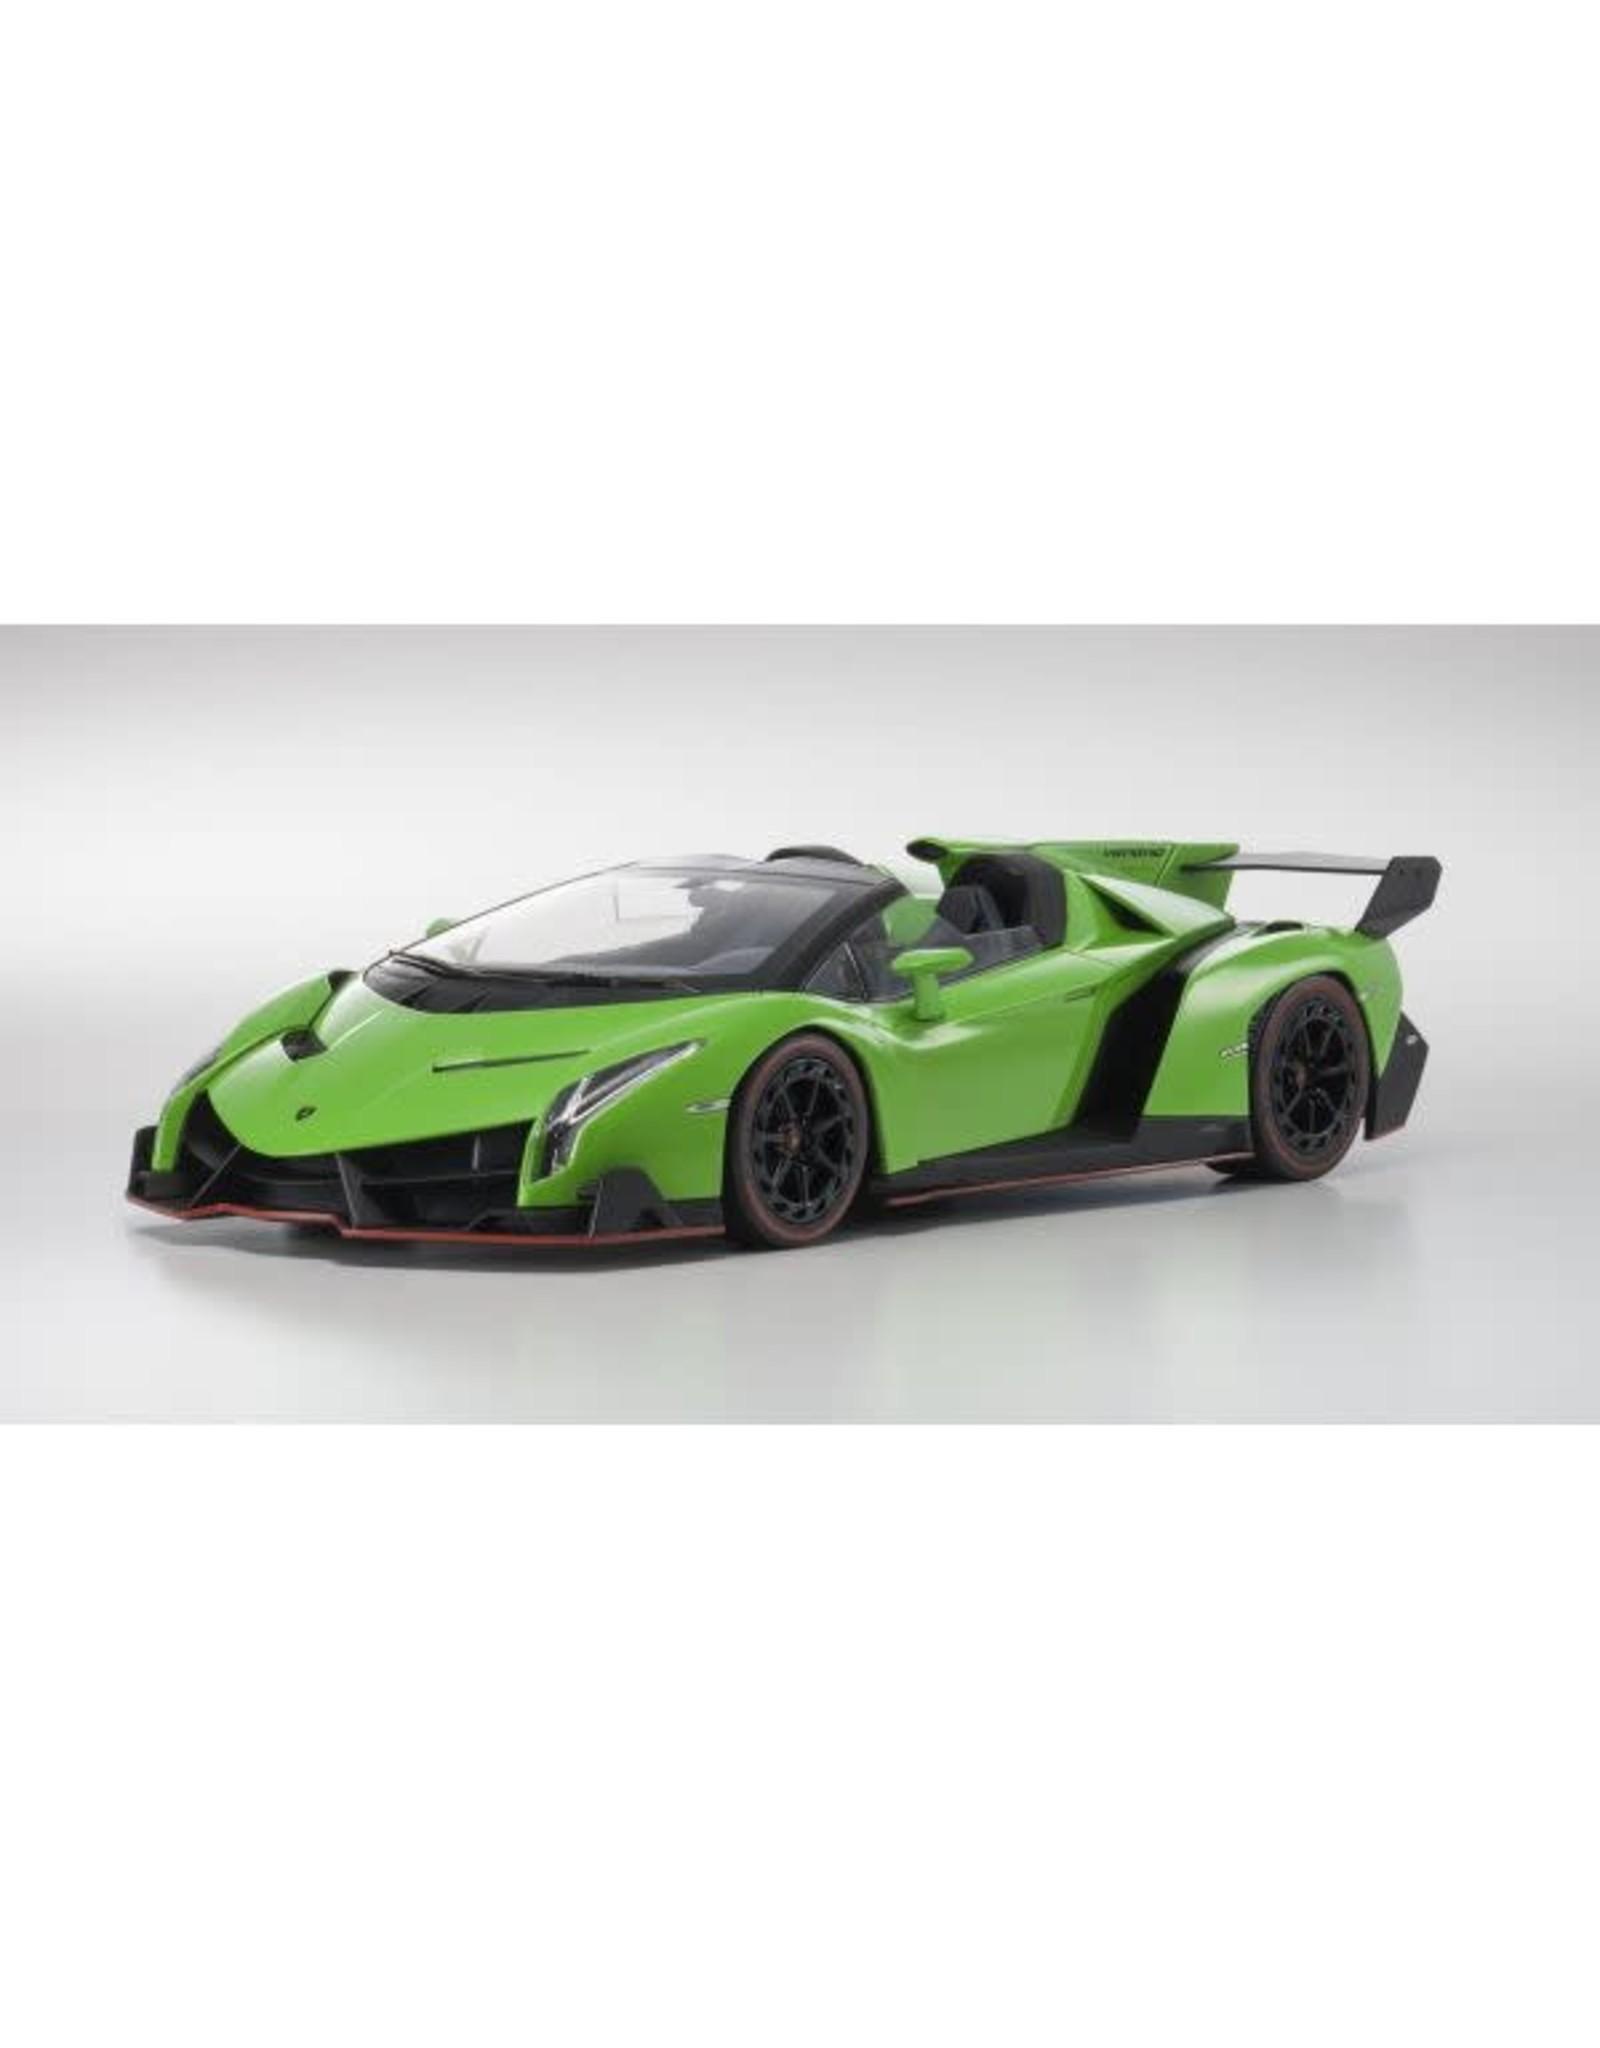 Kyosho 1:18 Lamborghini Veneno Roadster Green